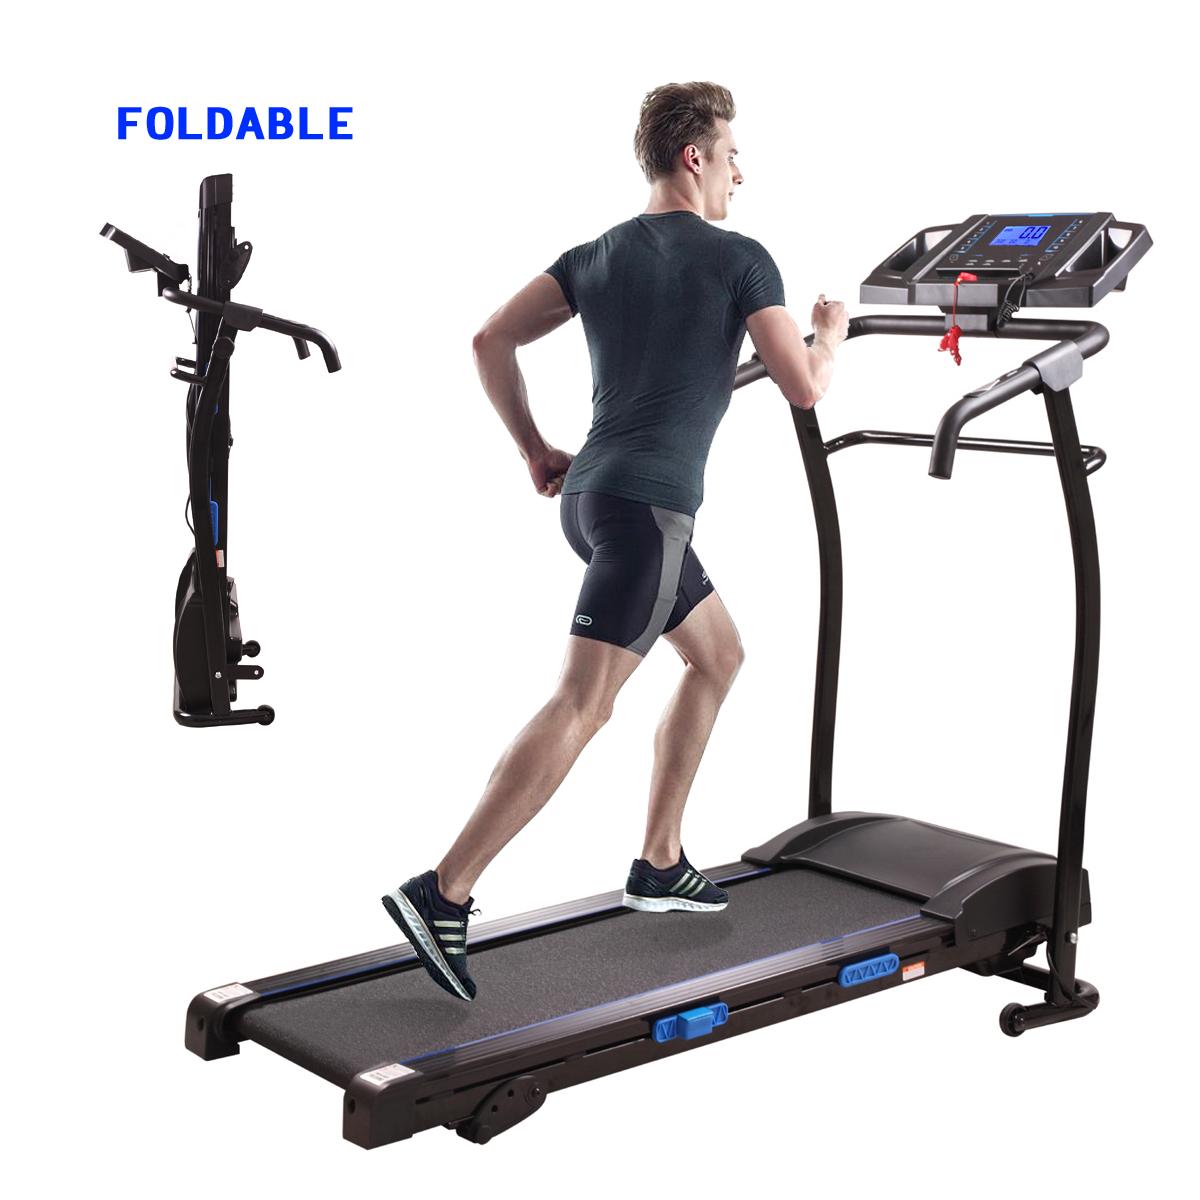 Jaxpety 1500W Treadmil Running Machine Folding Motorized Home Fitness Machine Black